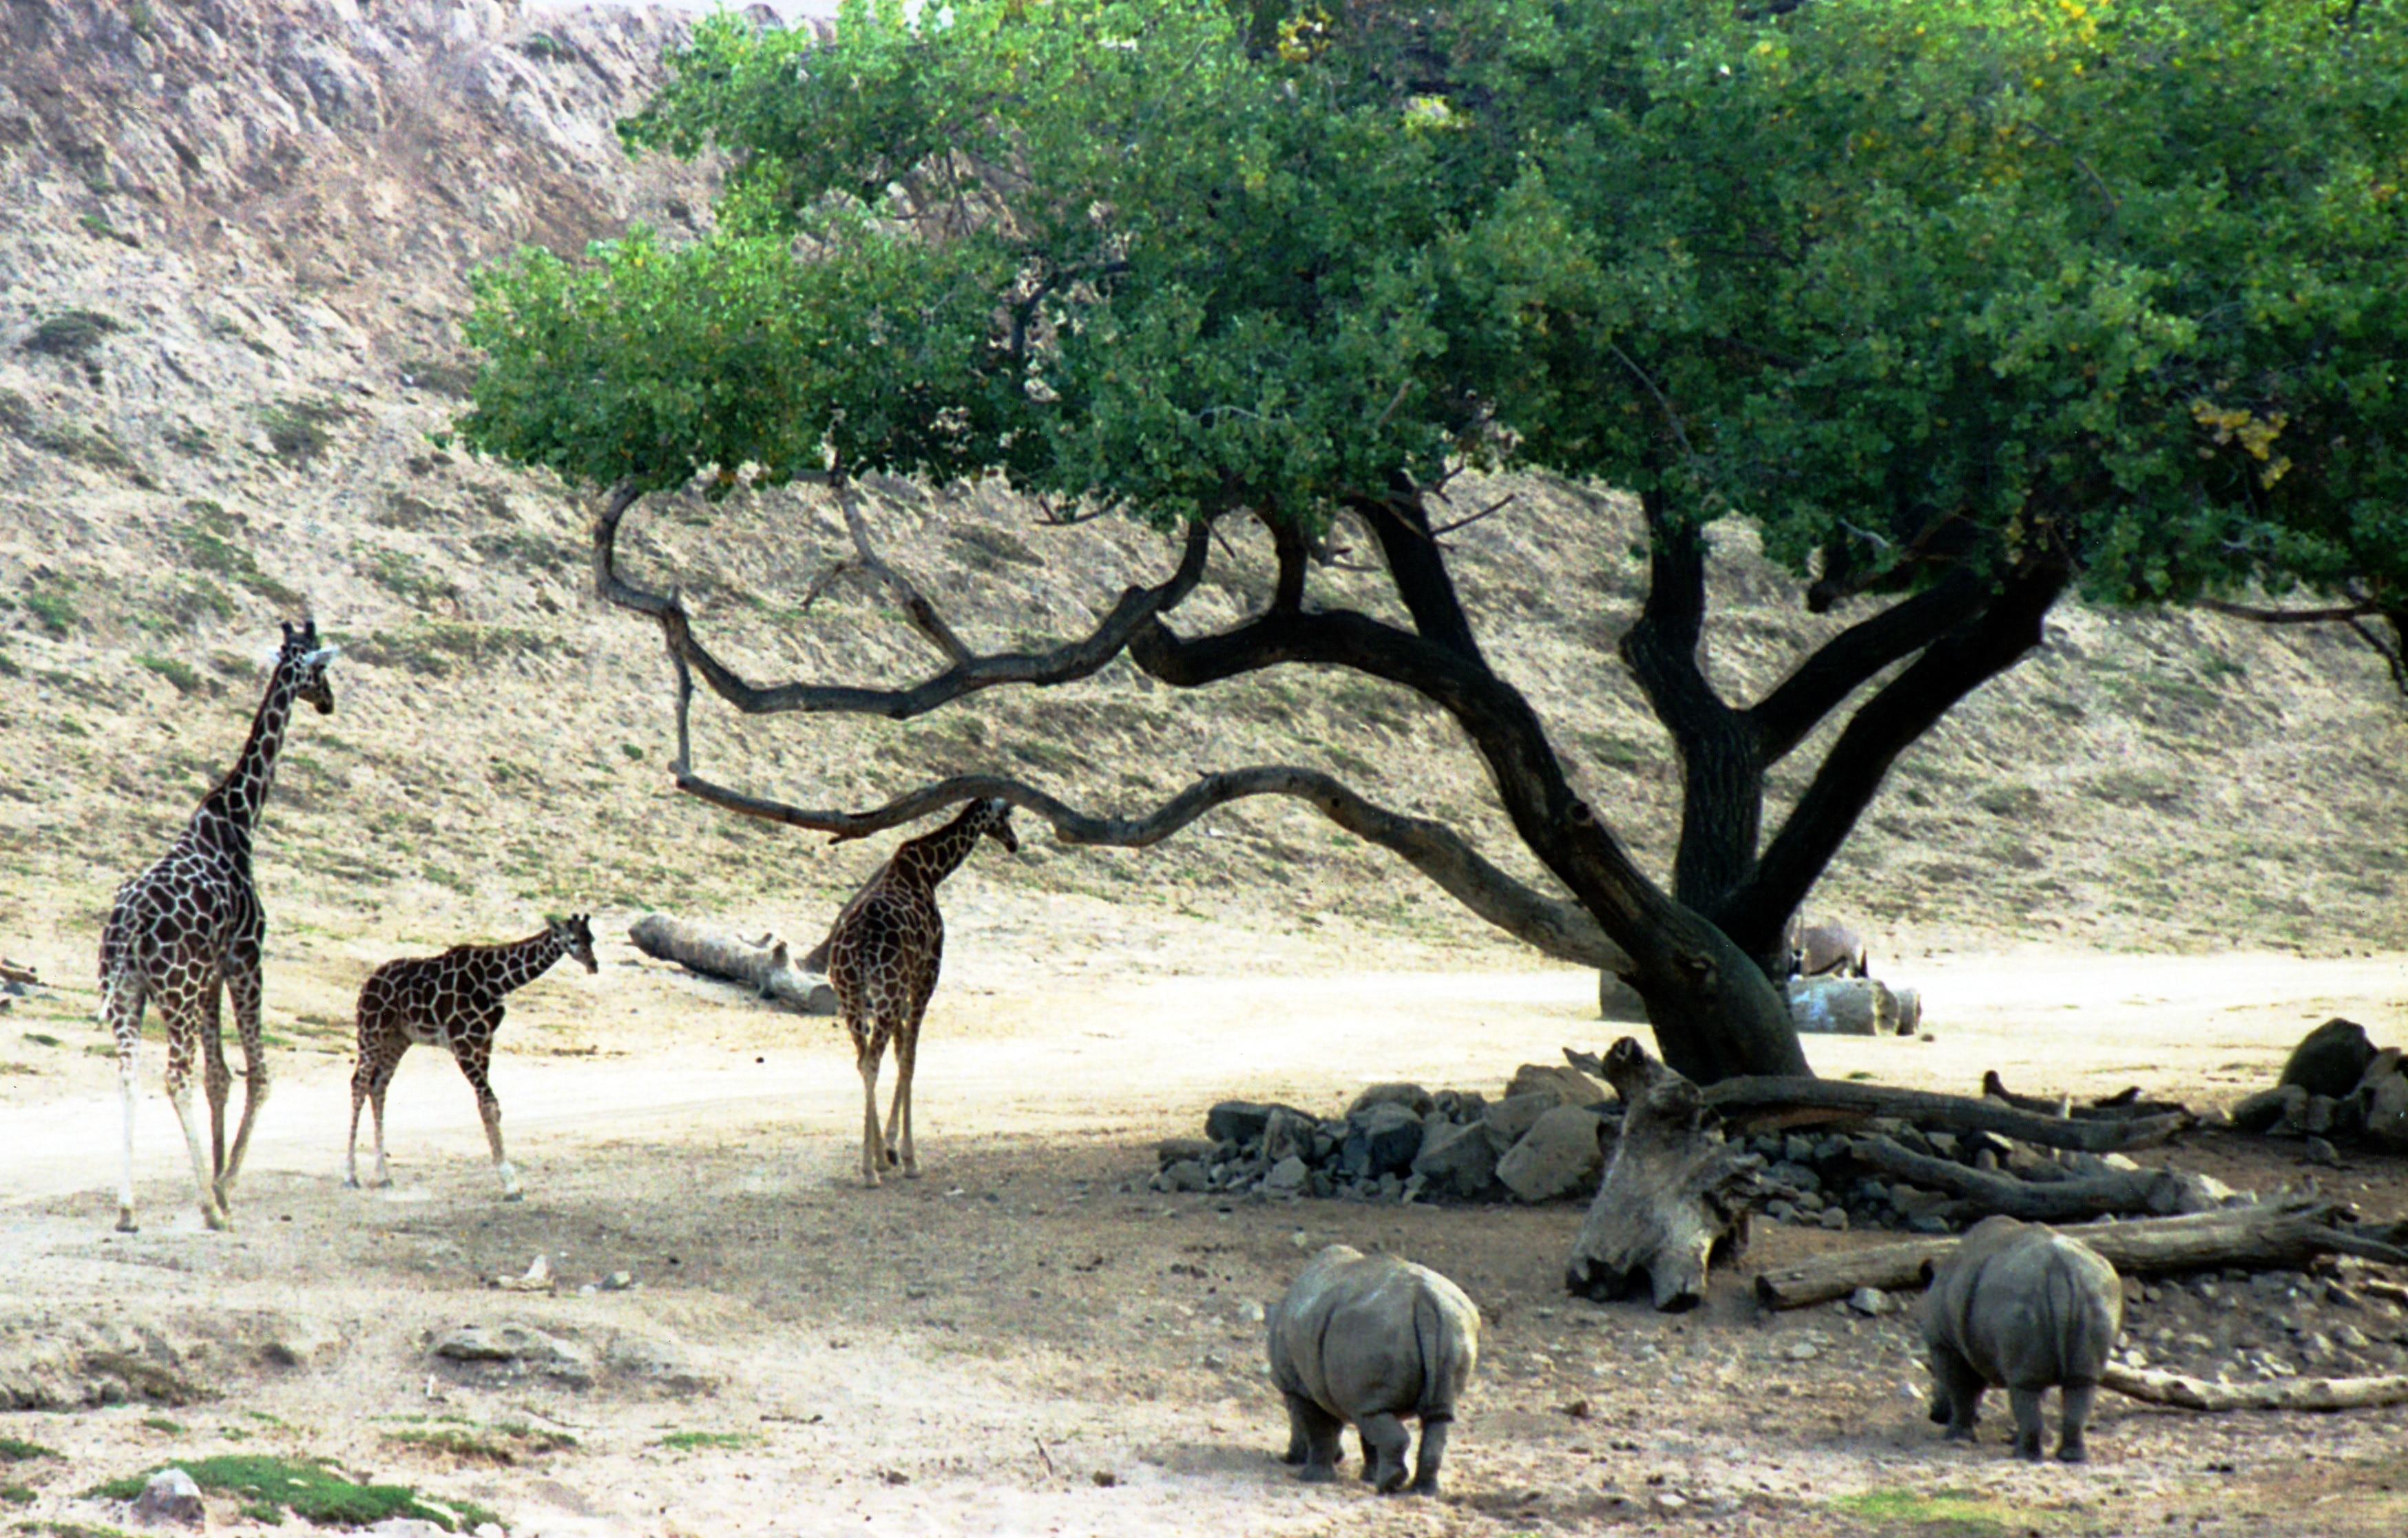 San Diego Zoo Safari Park, San Pasqual Valley, California, United States of America